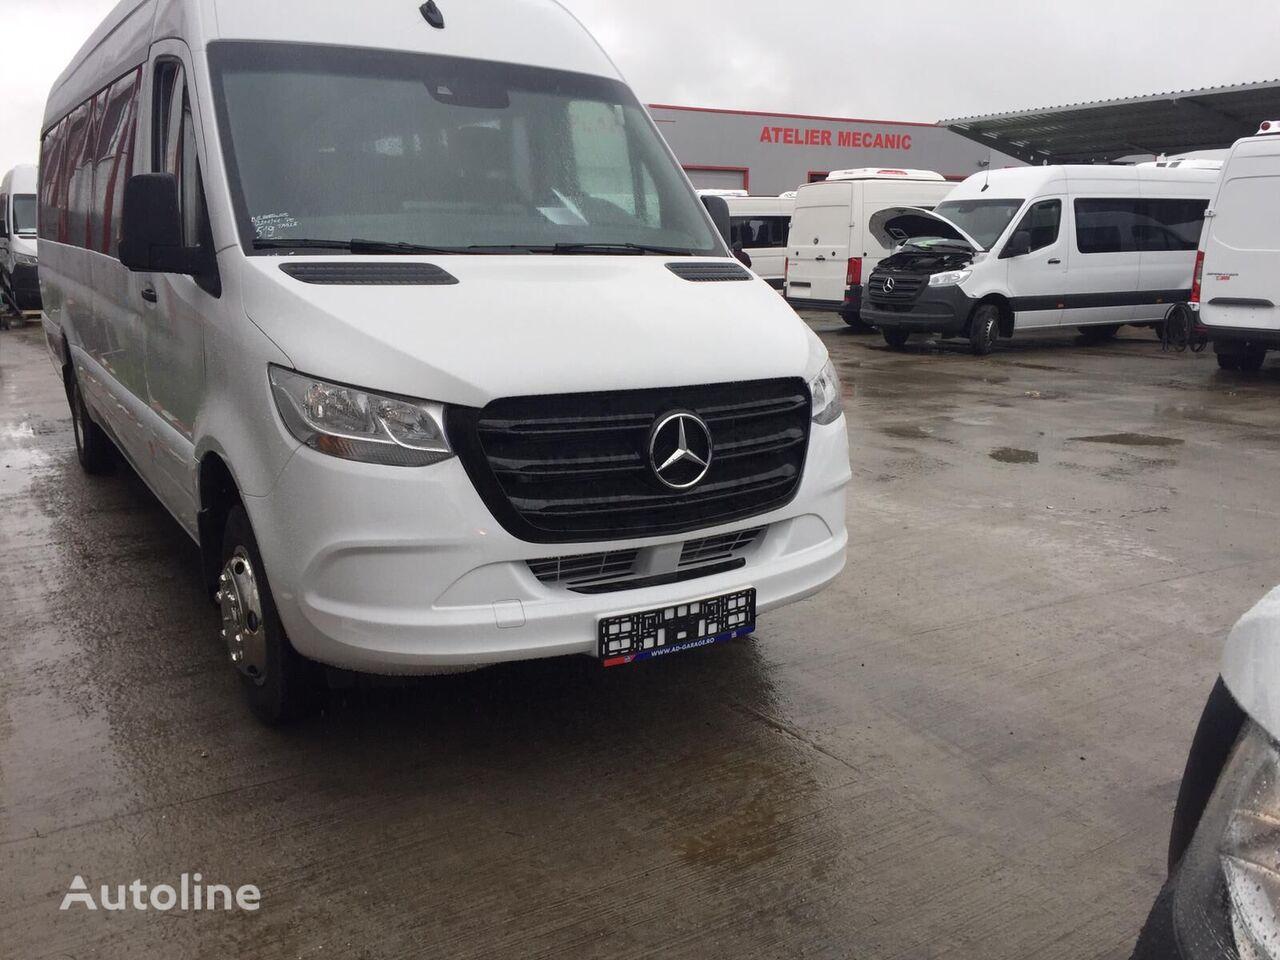 ny MERCEDES-BENZ Sprinter IDILIS 516,  22+1+1  *COC*  prolonged with 50cm fiber/s passager minibus